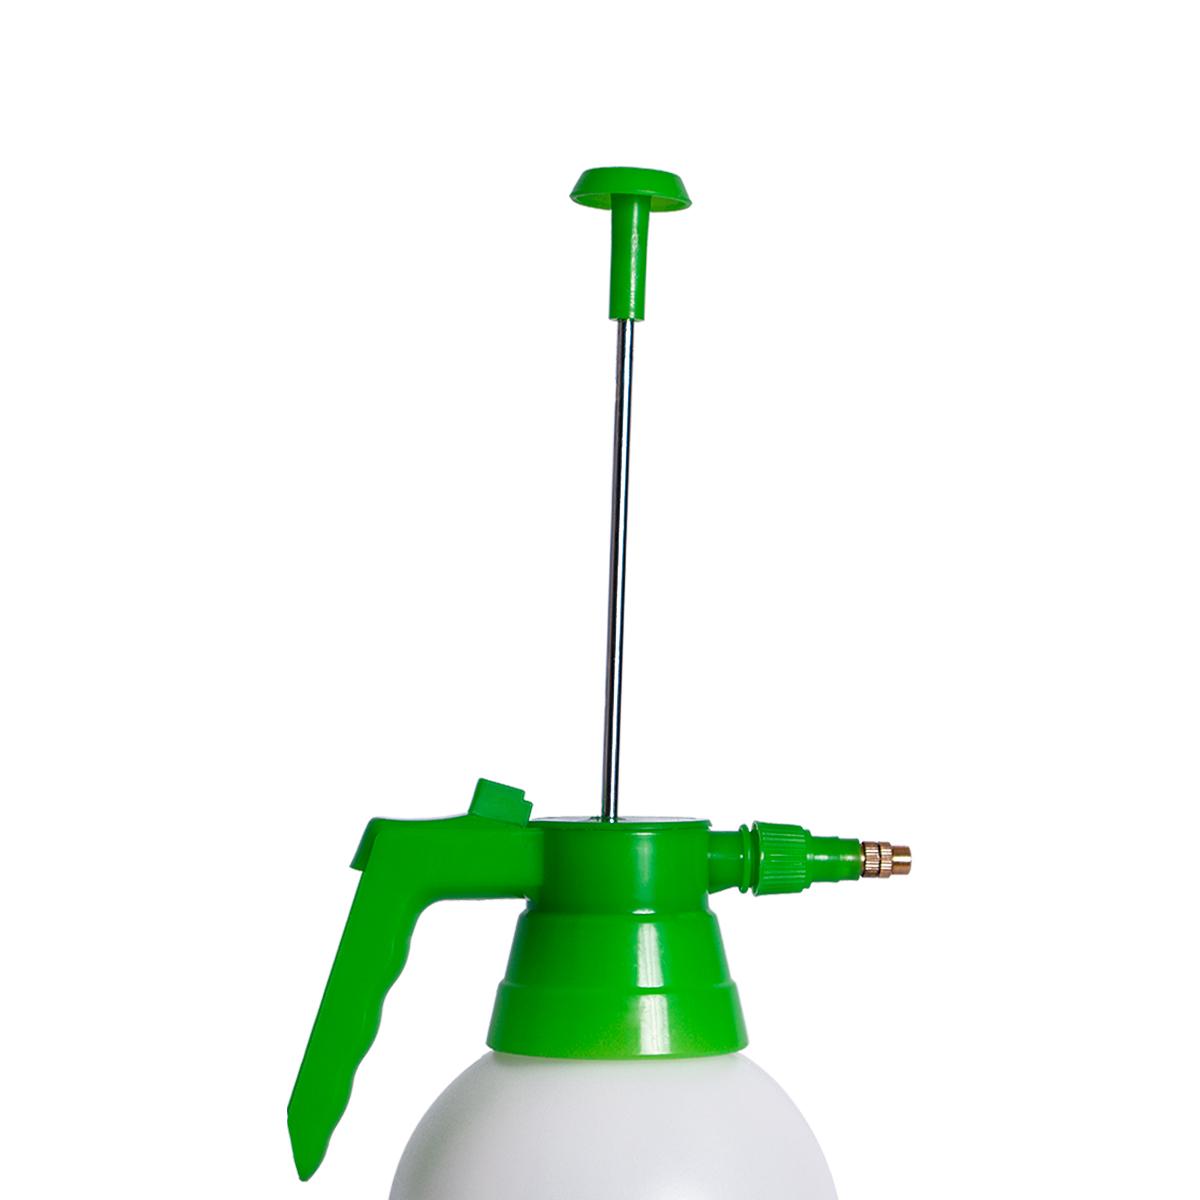 Kit Dux Defender Dul Germ H 5 Litros + Pulverizador Pressão Acumulada 2 litros SAPPA2L SuperAgri